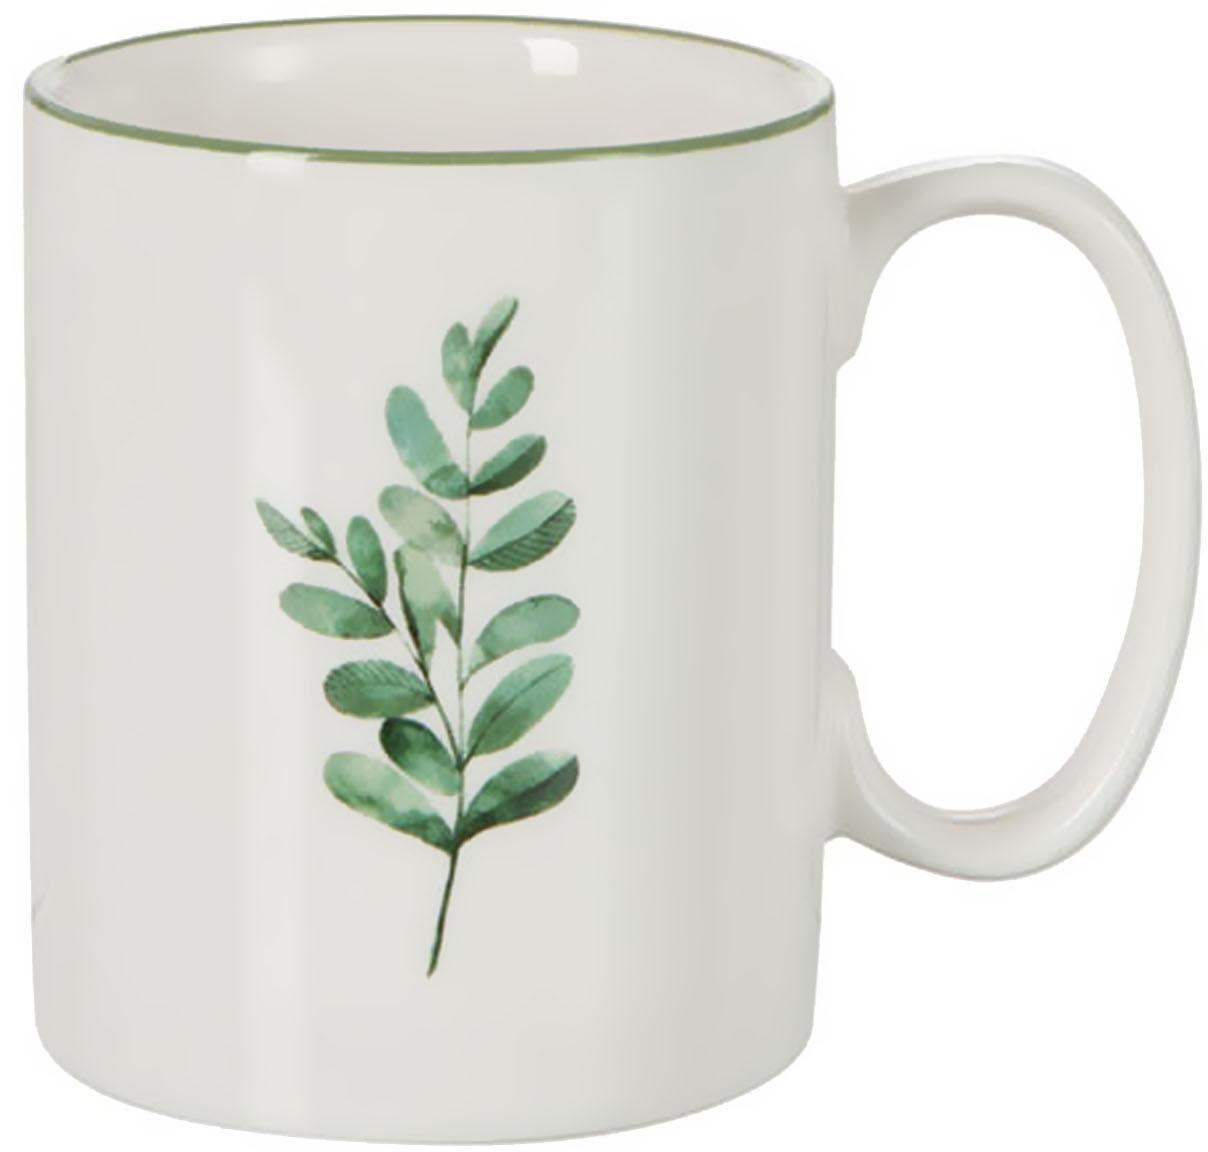 Tassen Eukalyptus mit Blatt-Motiv, 6 Stück, New Bone China, Weiss, Grün, Ø 8 cm